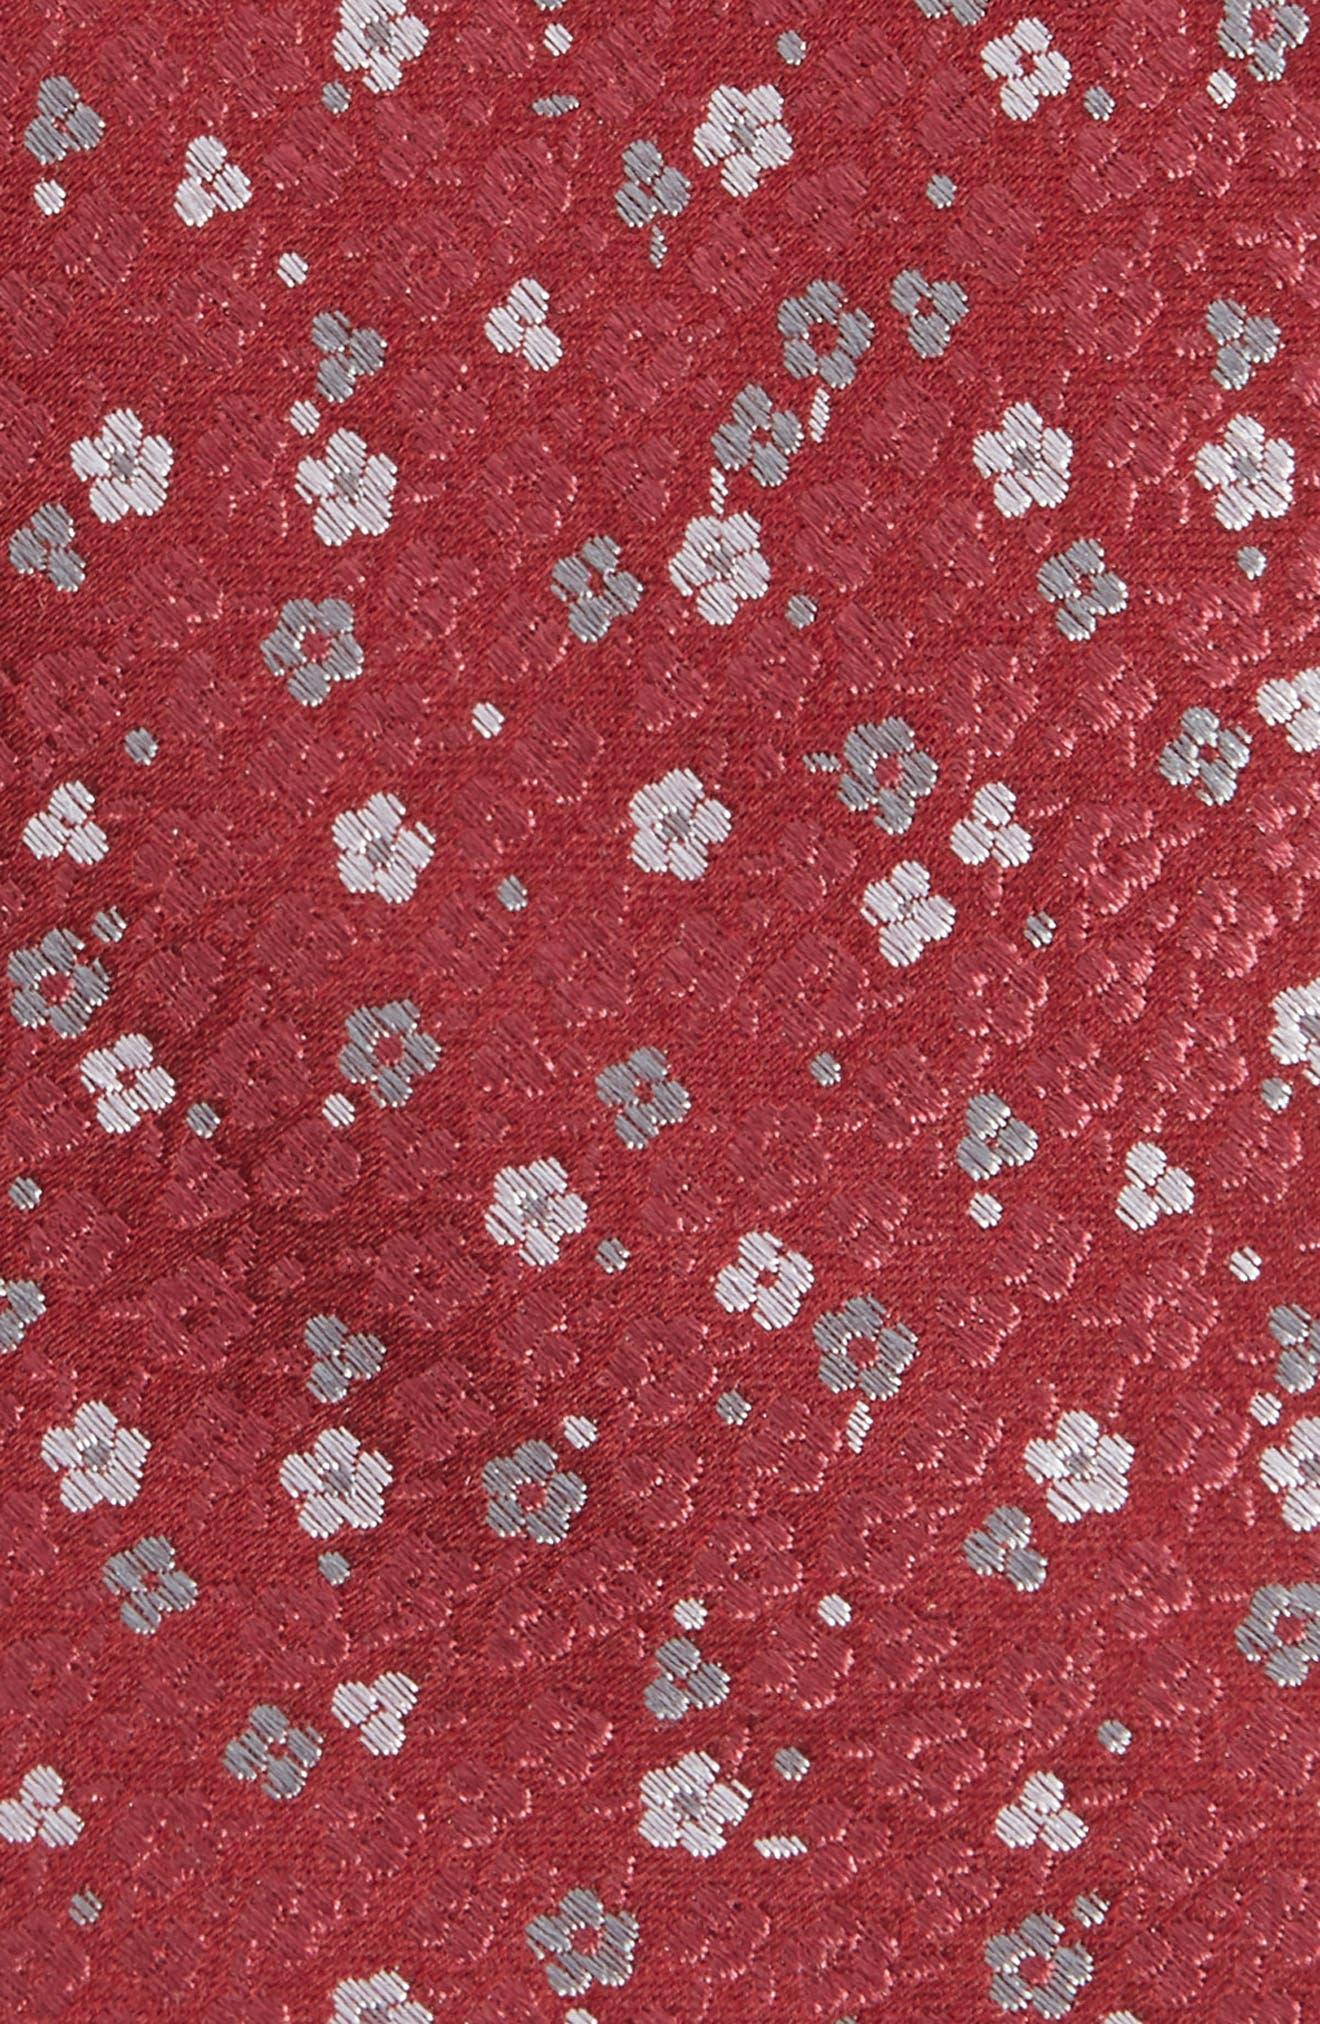 Flower Fields Silk Tie,                             Alternate thumbnail 2, color,                             Burgundy